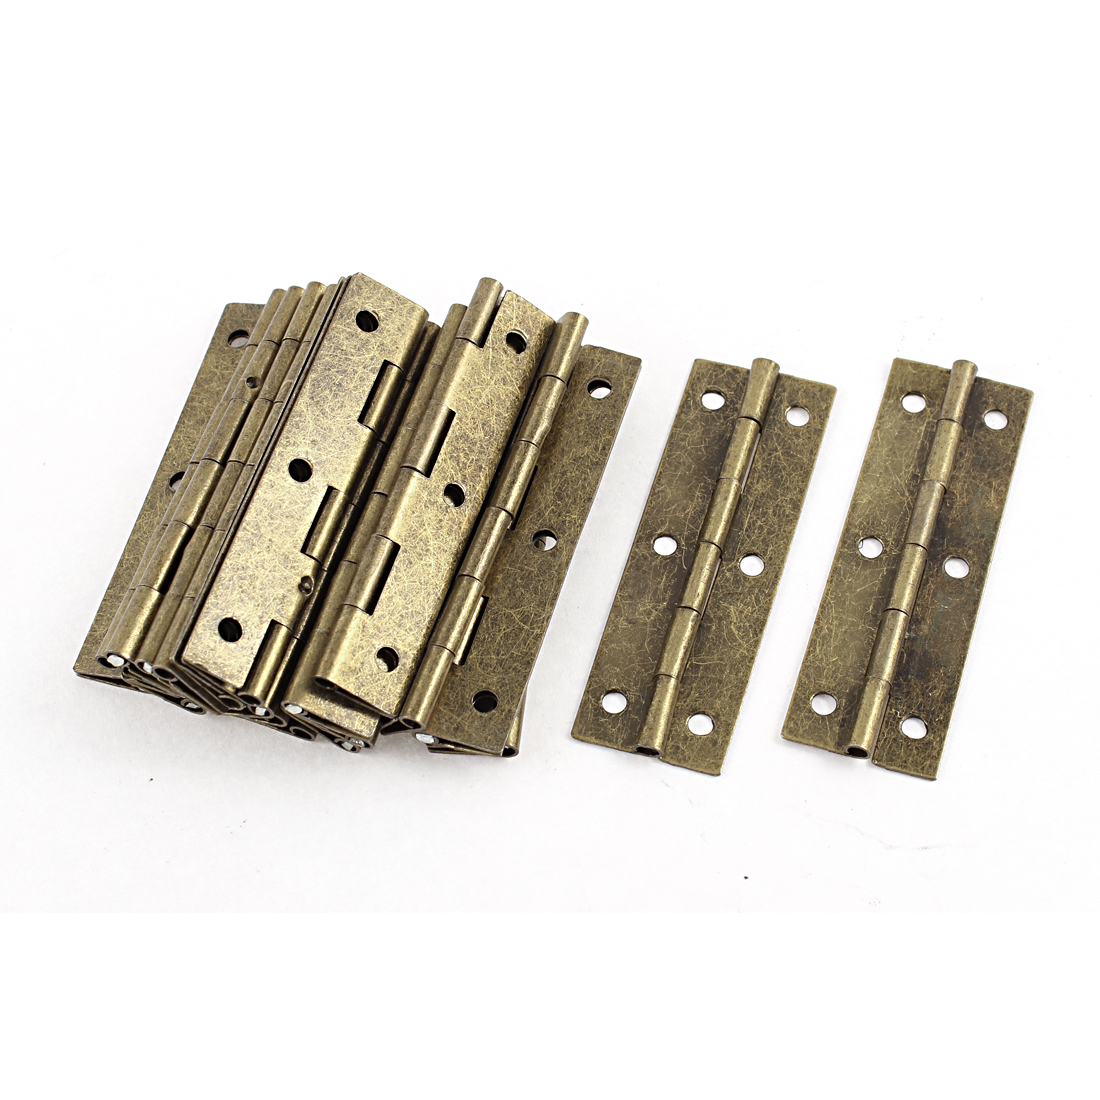 20 Pcs Brown Tone Rotatable Screw Mounted Door Hinges Hardware 20 x 60cm